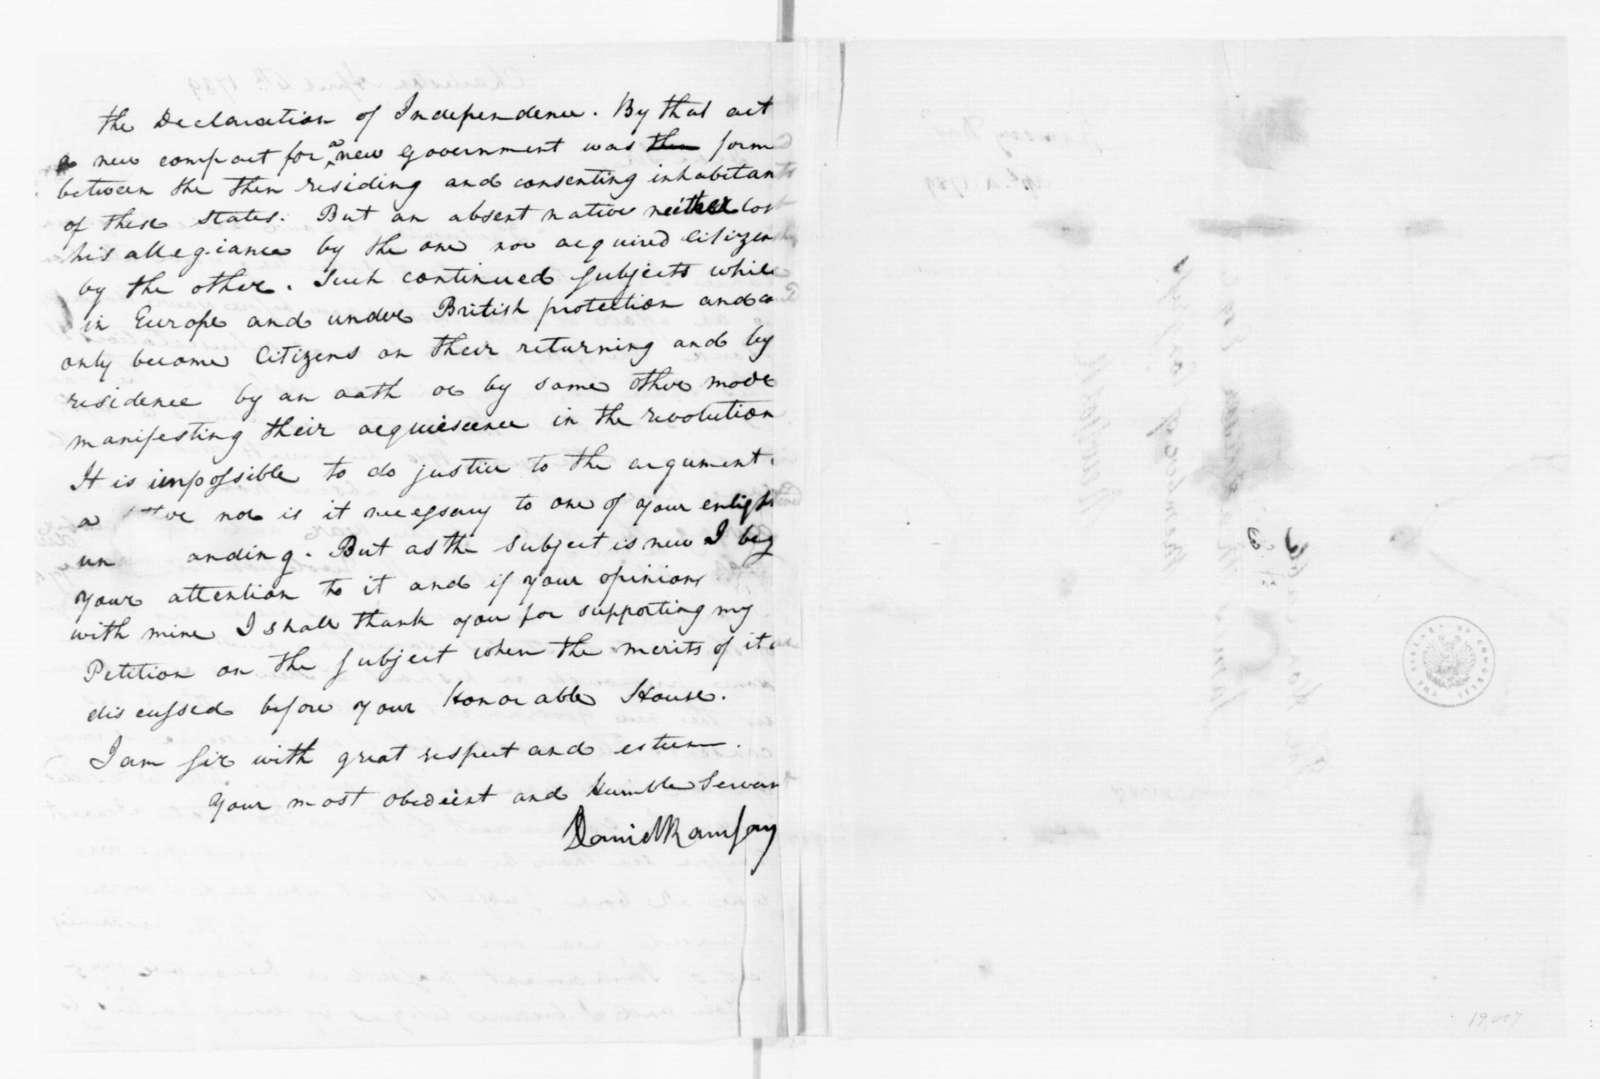 David Ramsay to James Madison, April 4, 1789.